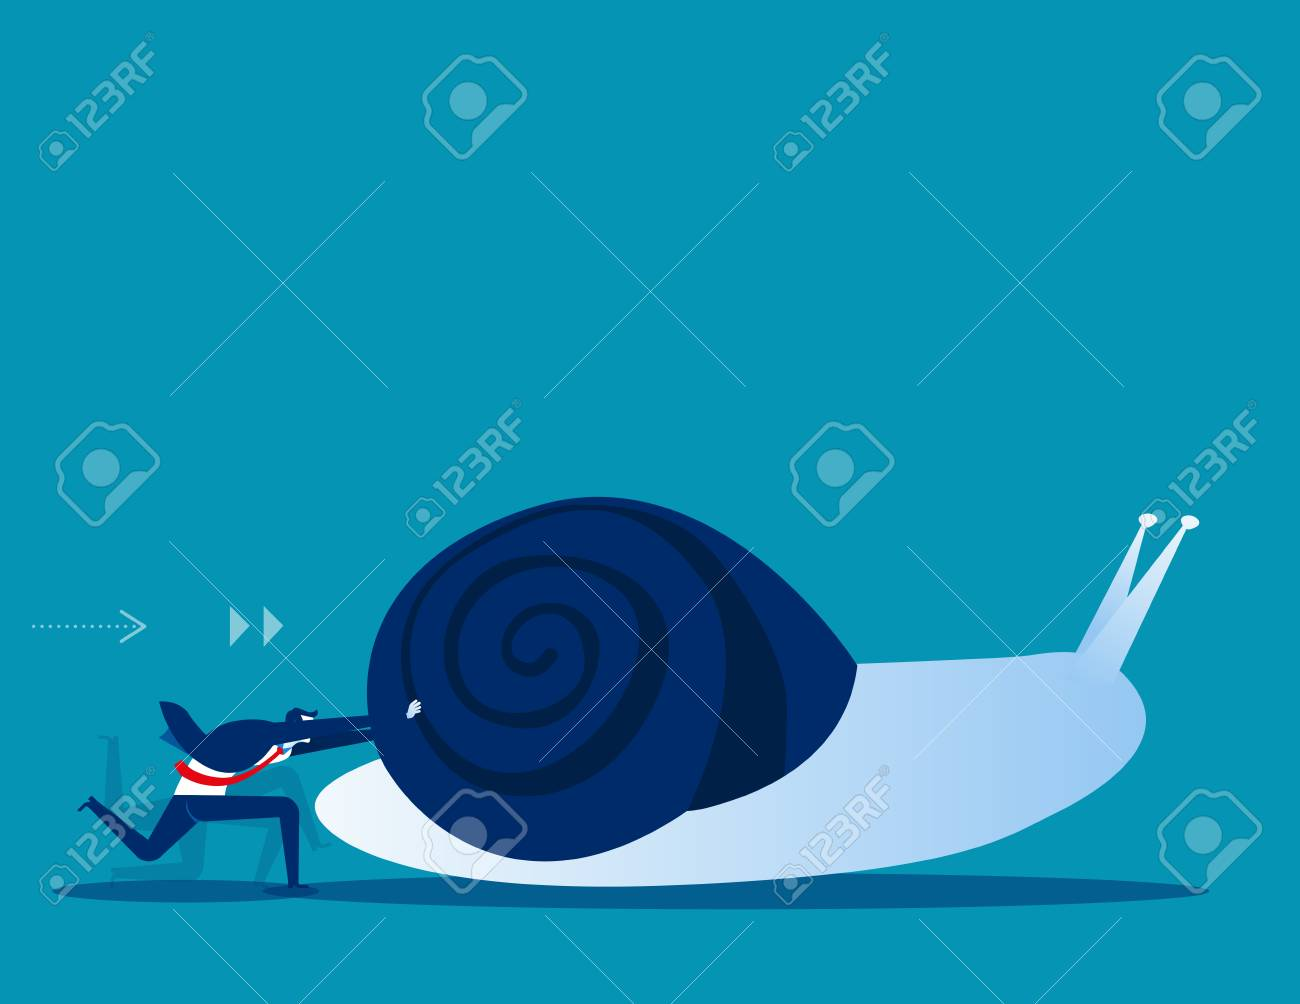 Businessman pushing snail. Concept business vector illustration. - 102826906